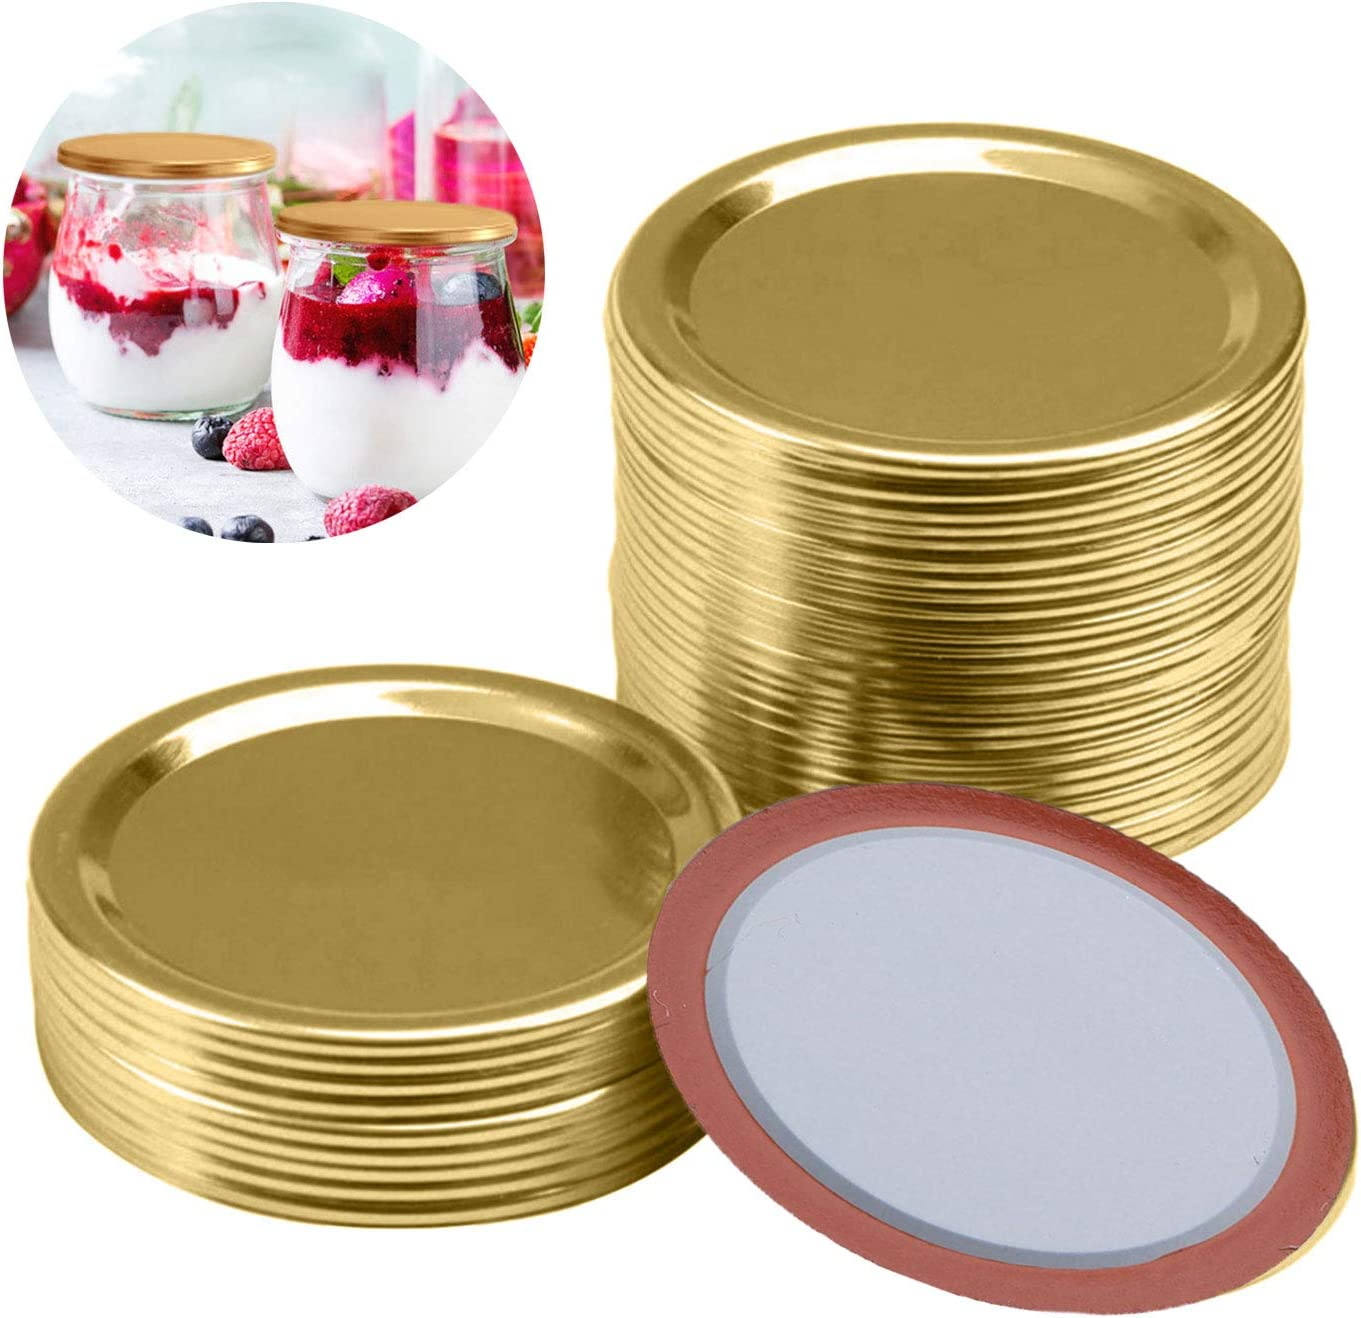 Gold, 96 70 mm Canning Lids Jar Lids Split-Type Lids Reusable Leak Proof Storage Solid Caps Metal Canning Jar Lids Compatible with Mason Jar for Pickling Canning Jar Lid Storage